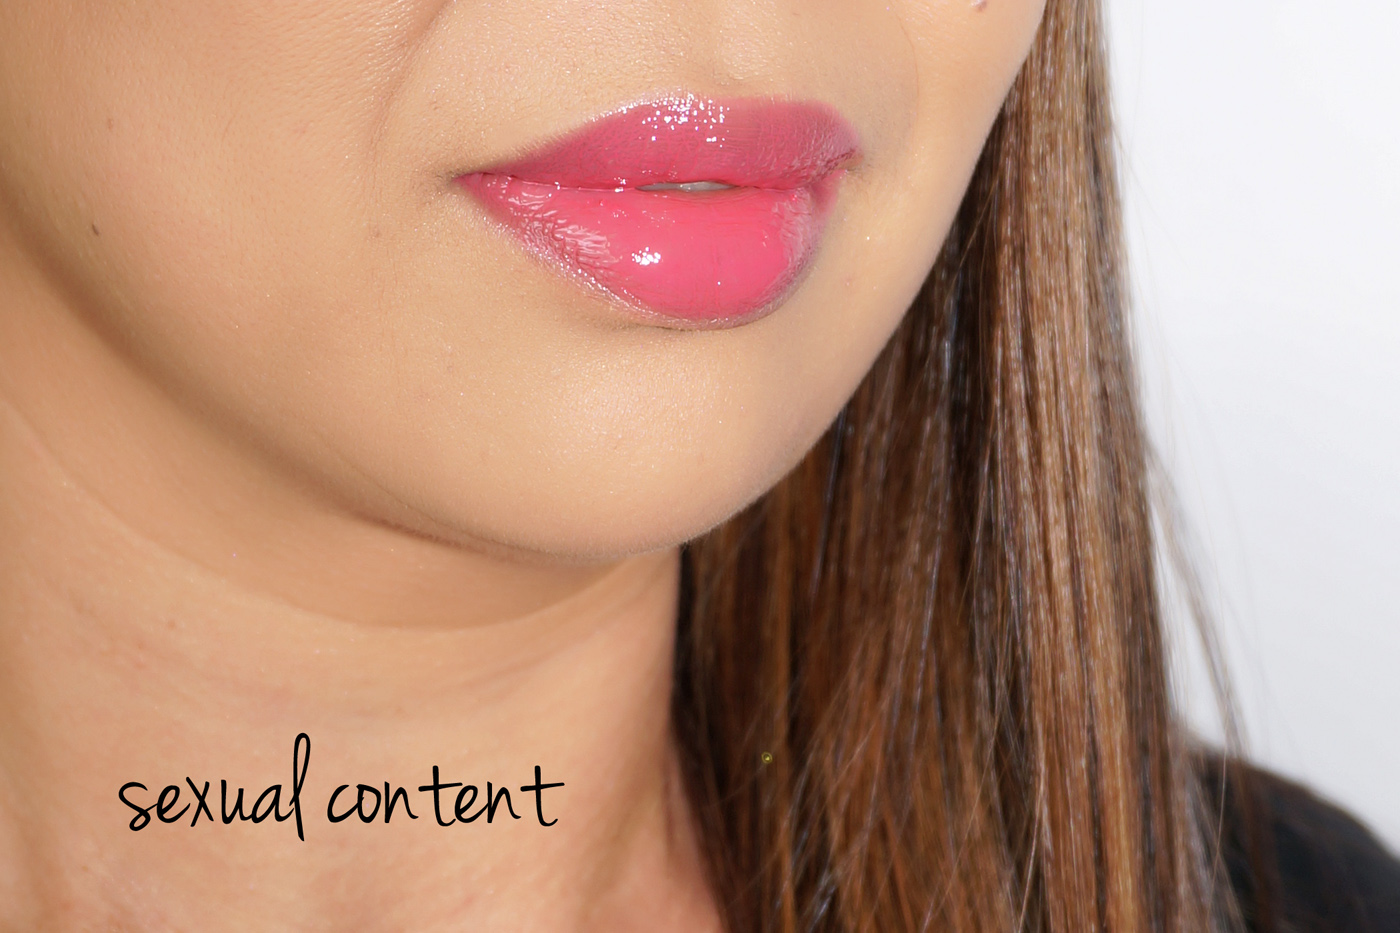 NARS Lip Gloss Swatch Contenu sexuel